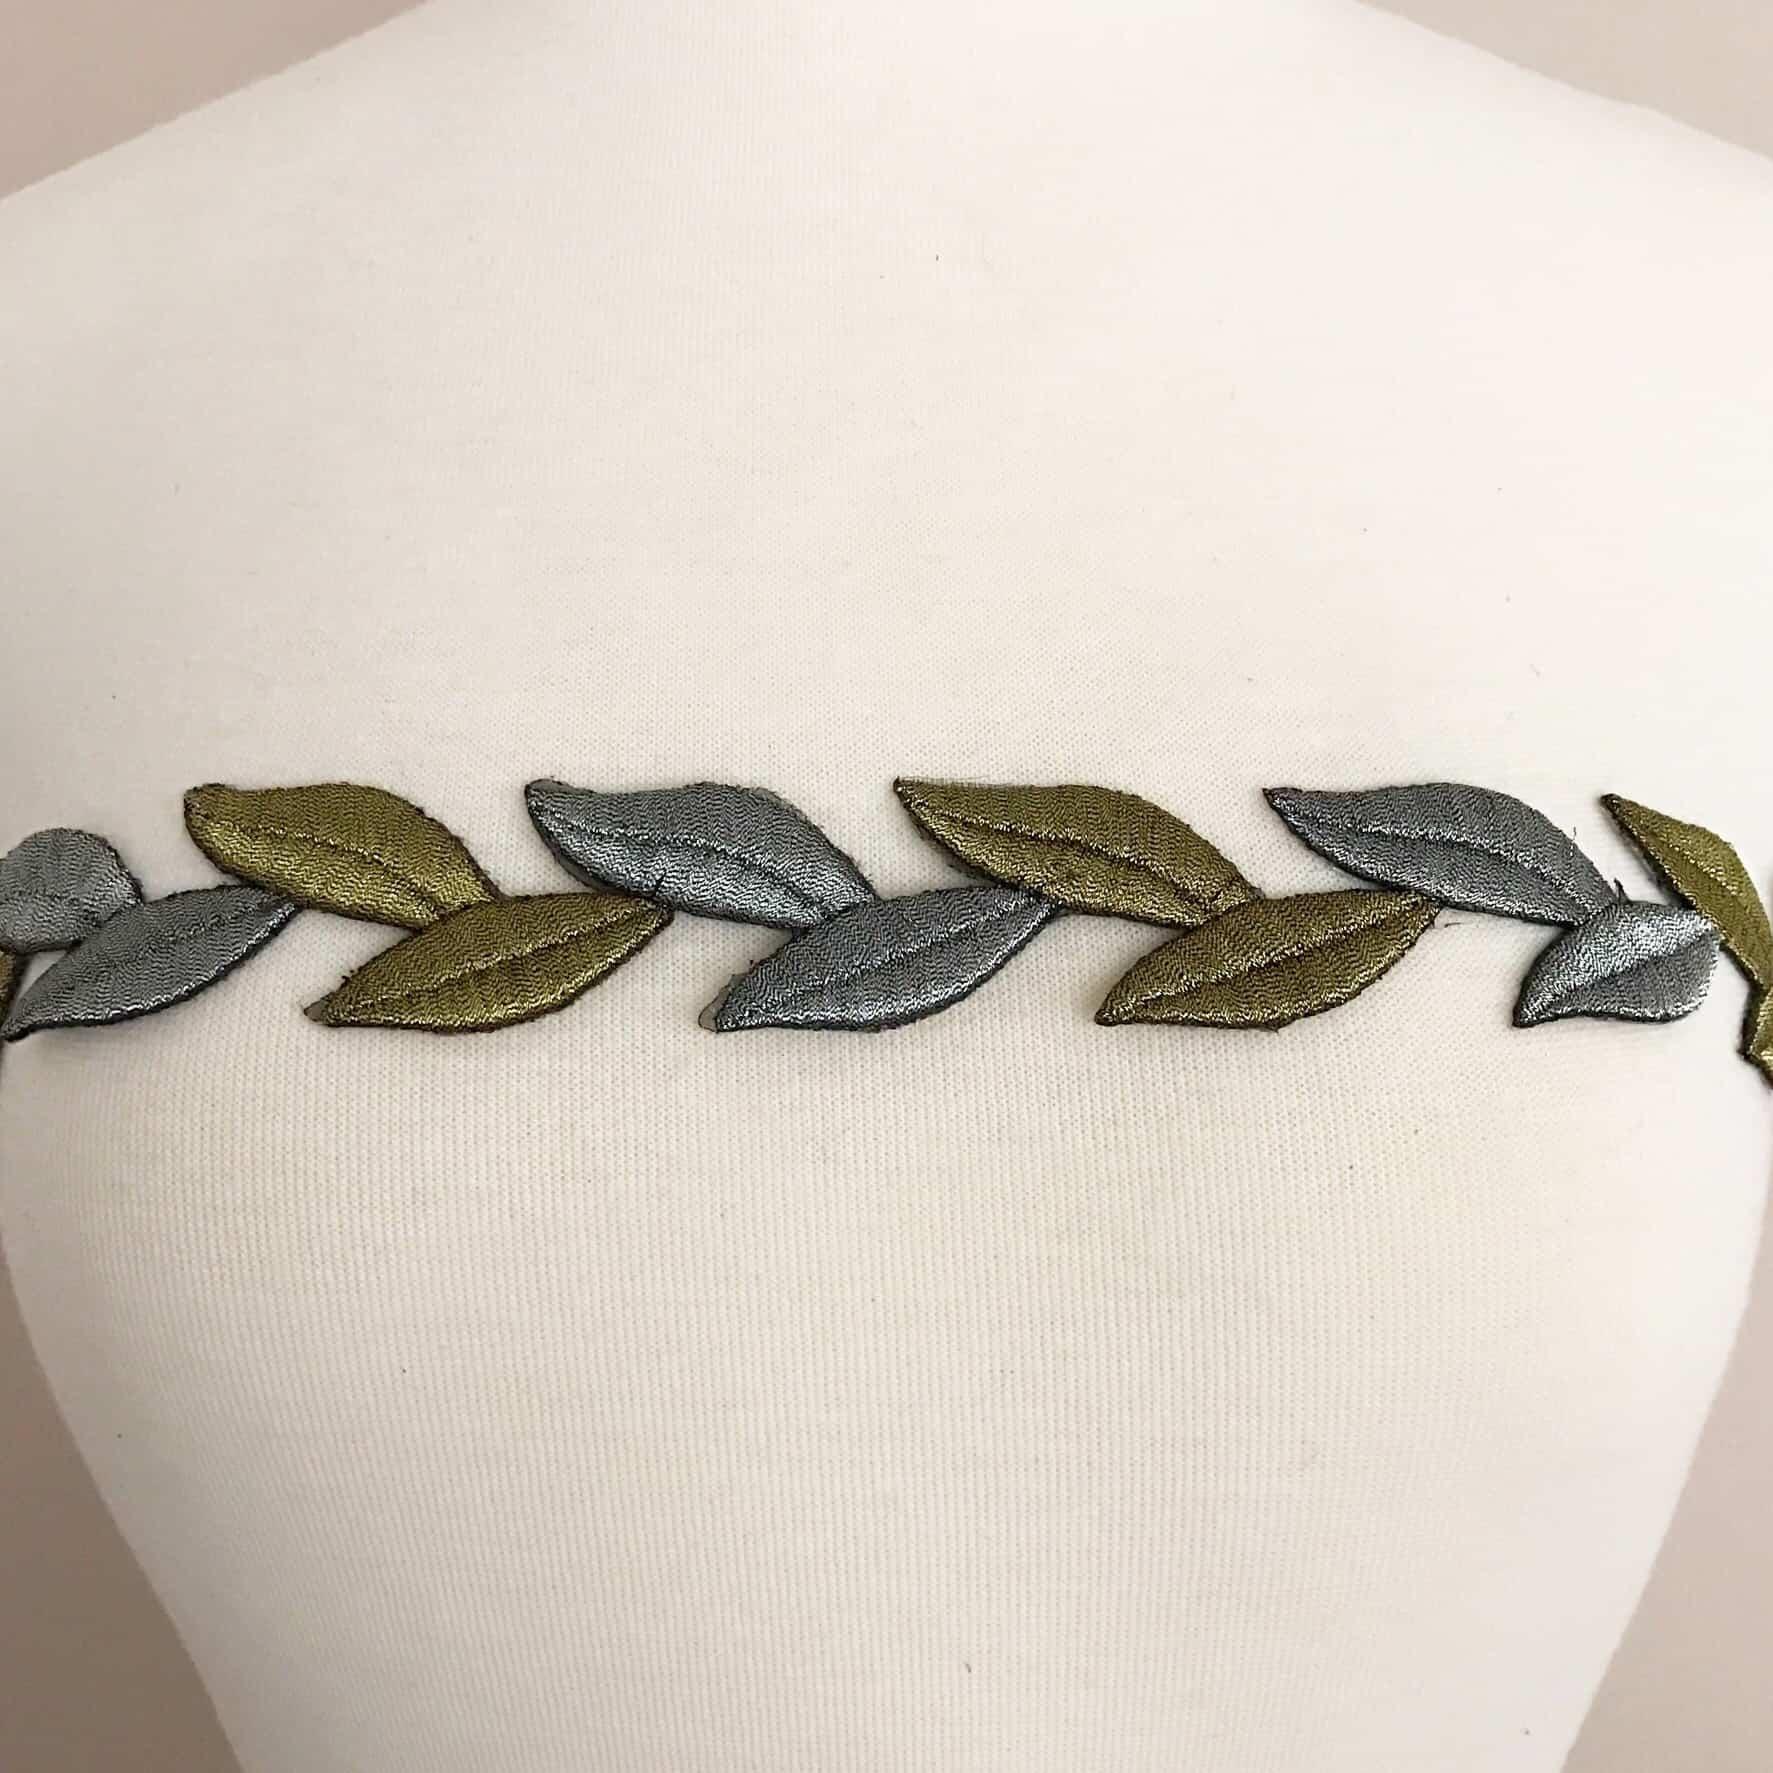 Metallic Leaves Embroidered Trim (Iron-On)